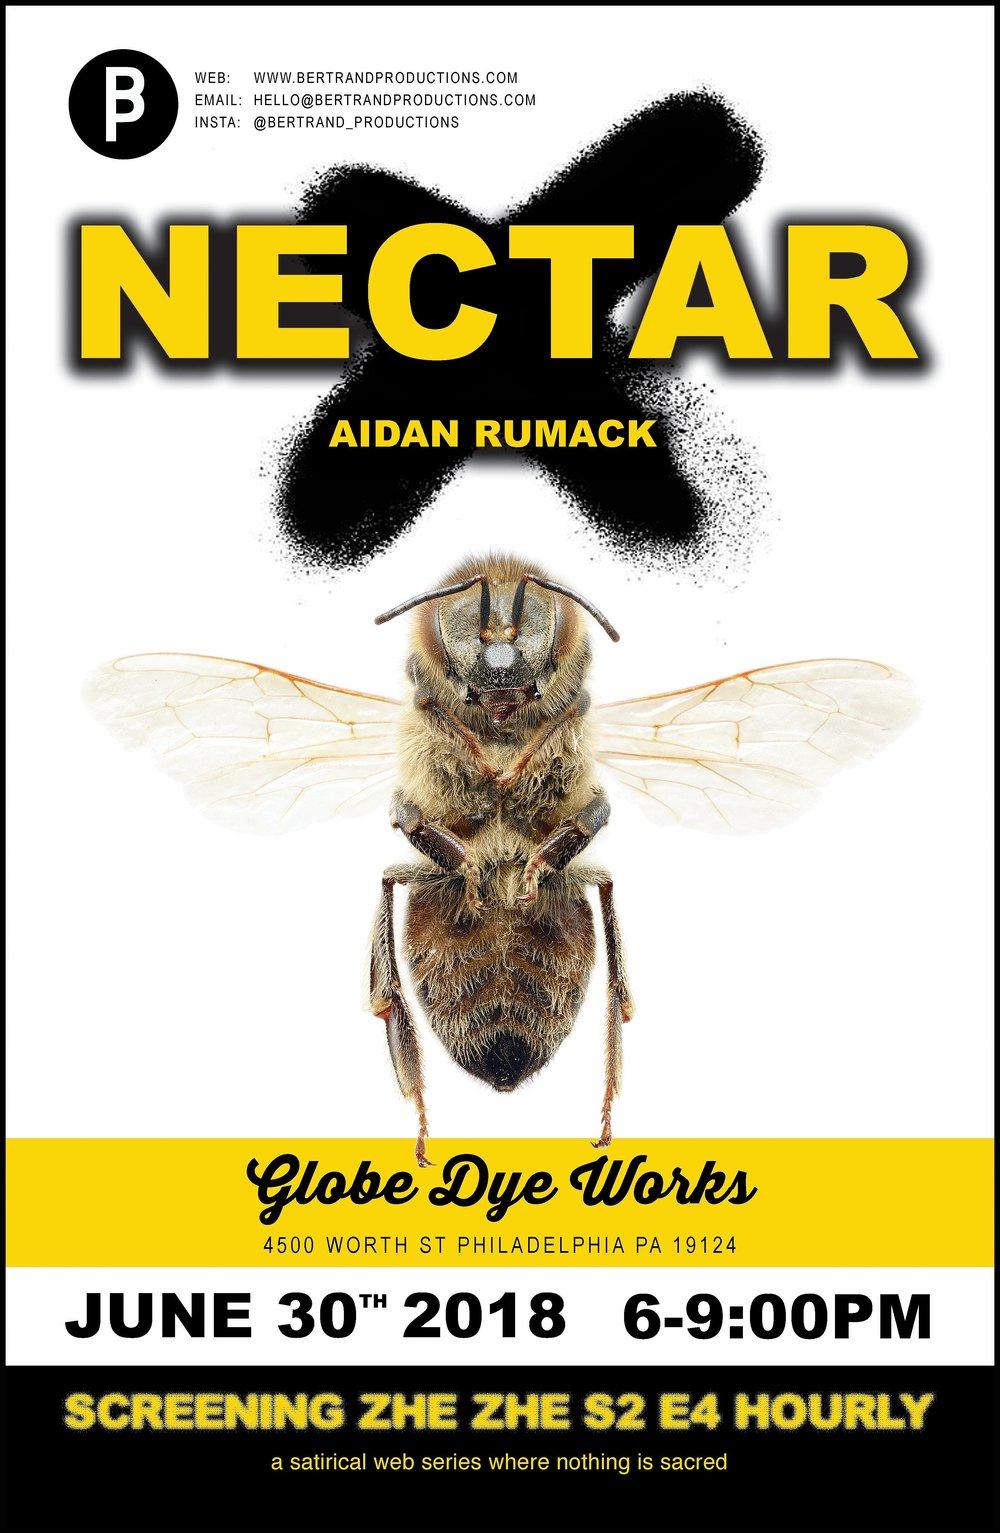 NECTAR - Artists: Aidan Rumack & Zhe ZheOpening Party - Saturday June 30, 2018 6-9pmShow Open July 2018Globe Dye Works BuildingPhiladelphia PA USA